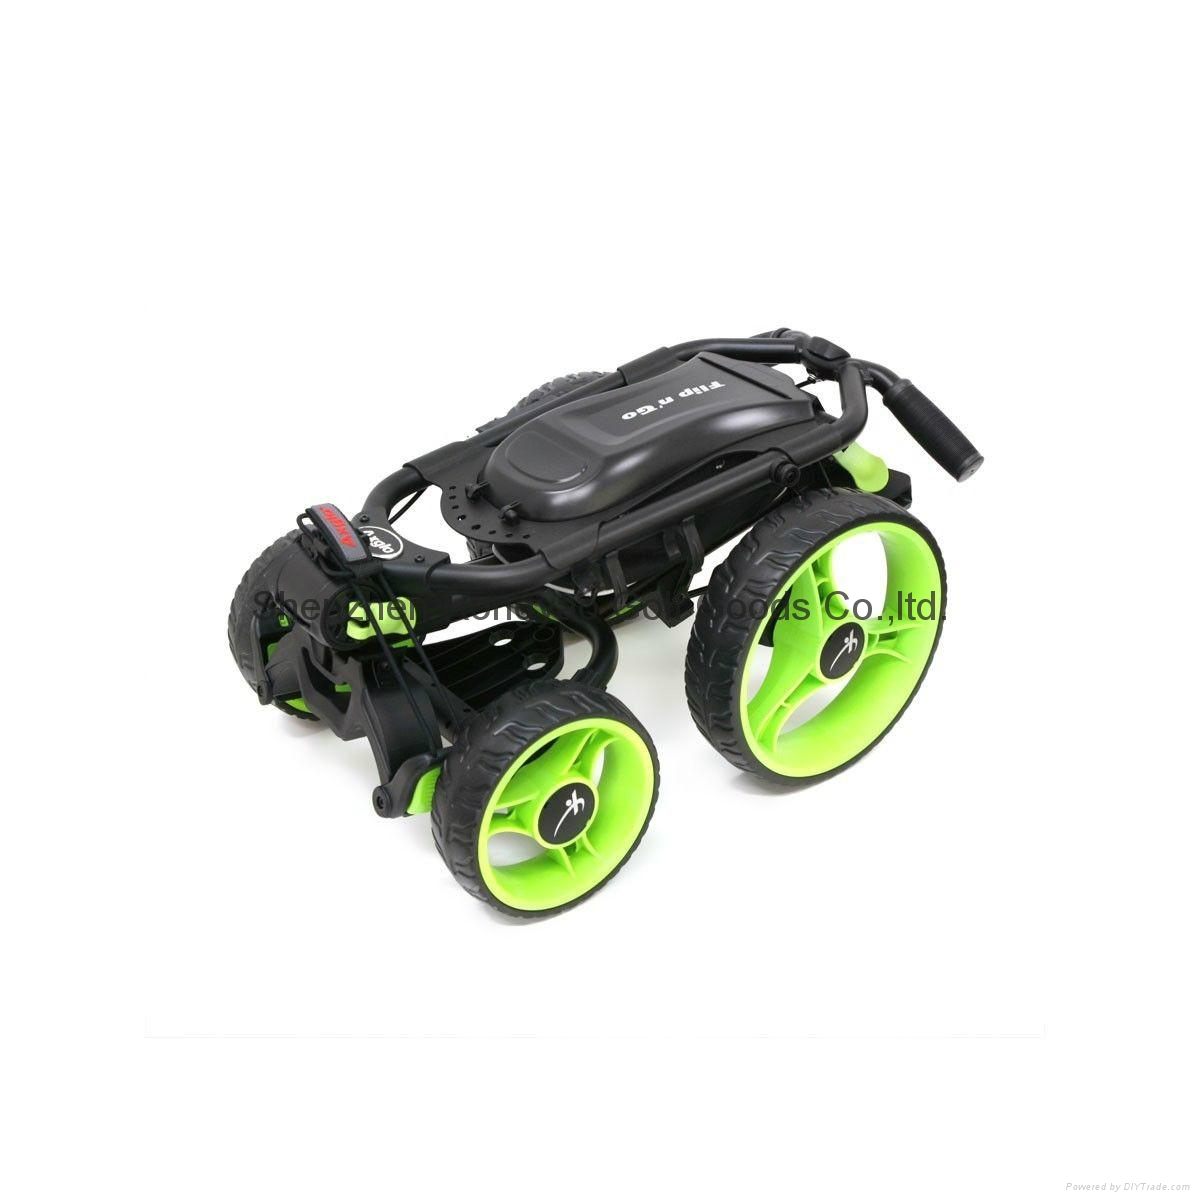 Axglo Flip N' Go 4 Wheel Golf Push Cart Black Red (China ... on solar golf cart, 4 wheel luggage cart folding, 4 wheel golf caddy, 4 wheel hose cart, 4 wheel golf scooter, 4 wheel hand cart, garden push cart, 4wd golf cart, clicgear push cart, all terrain golf cart, motorized pull cart, 4 wheel platform cart, funny golf cart, 4 wheel heavy duty flat carts, micro golf cart, cadie golf cart, 3 wheel golf cart, aluminum push cart, 4 wheel gas golf carts, 4 wheel bag boy push cart,